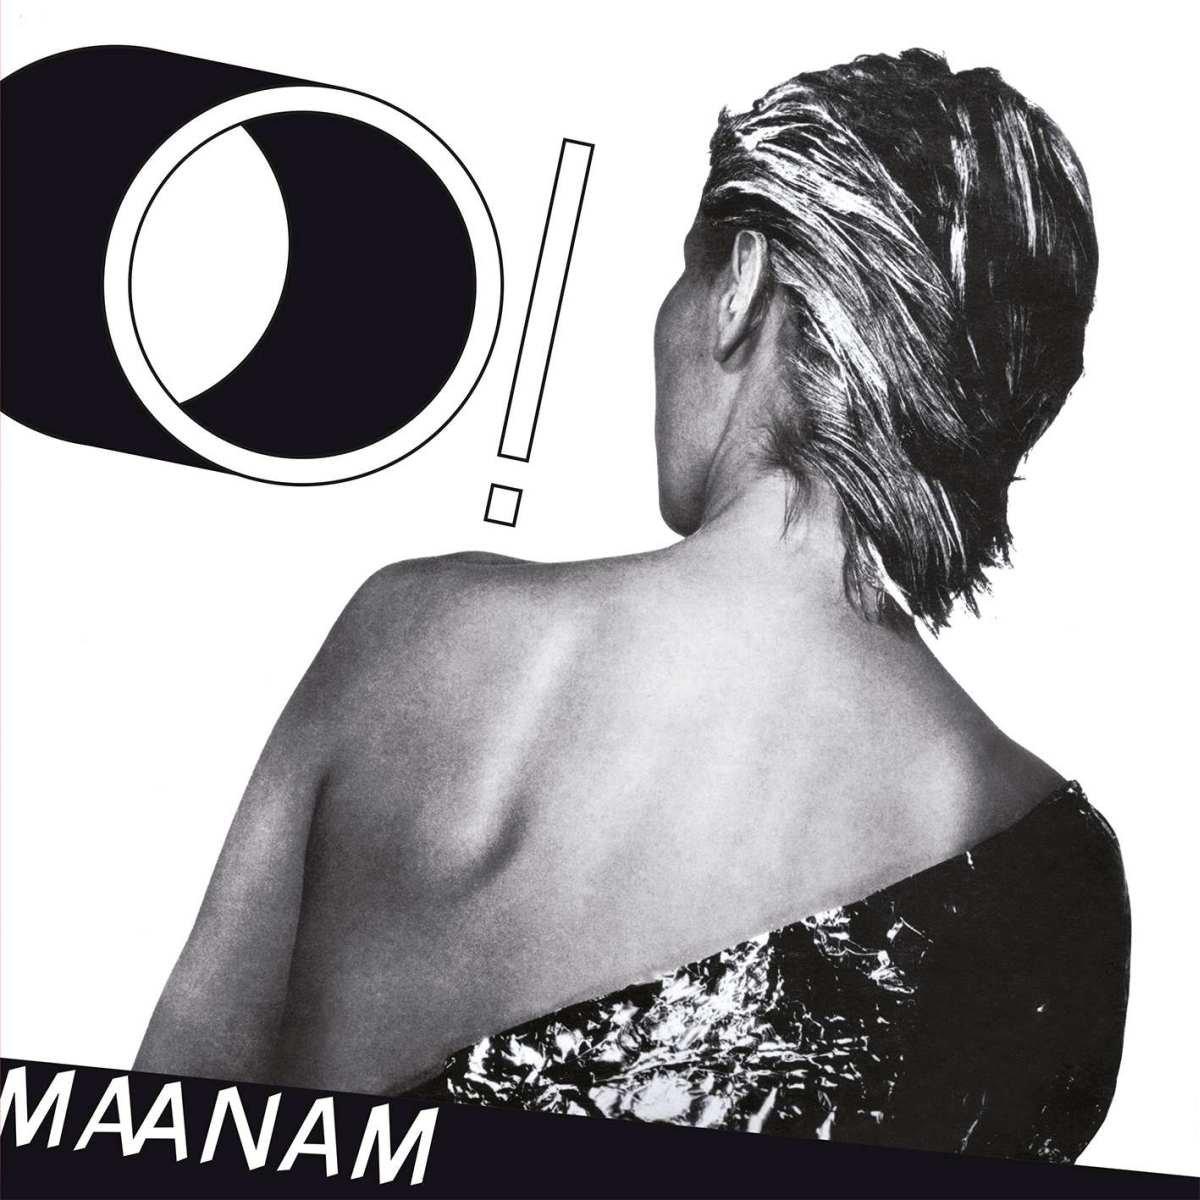 Maanam_O!.jpg